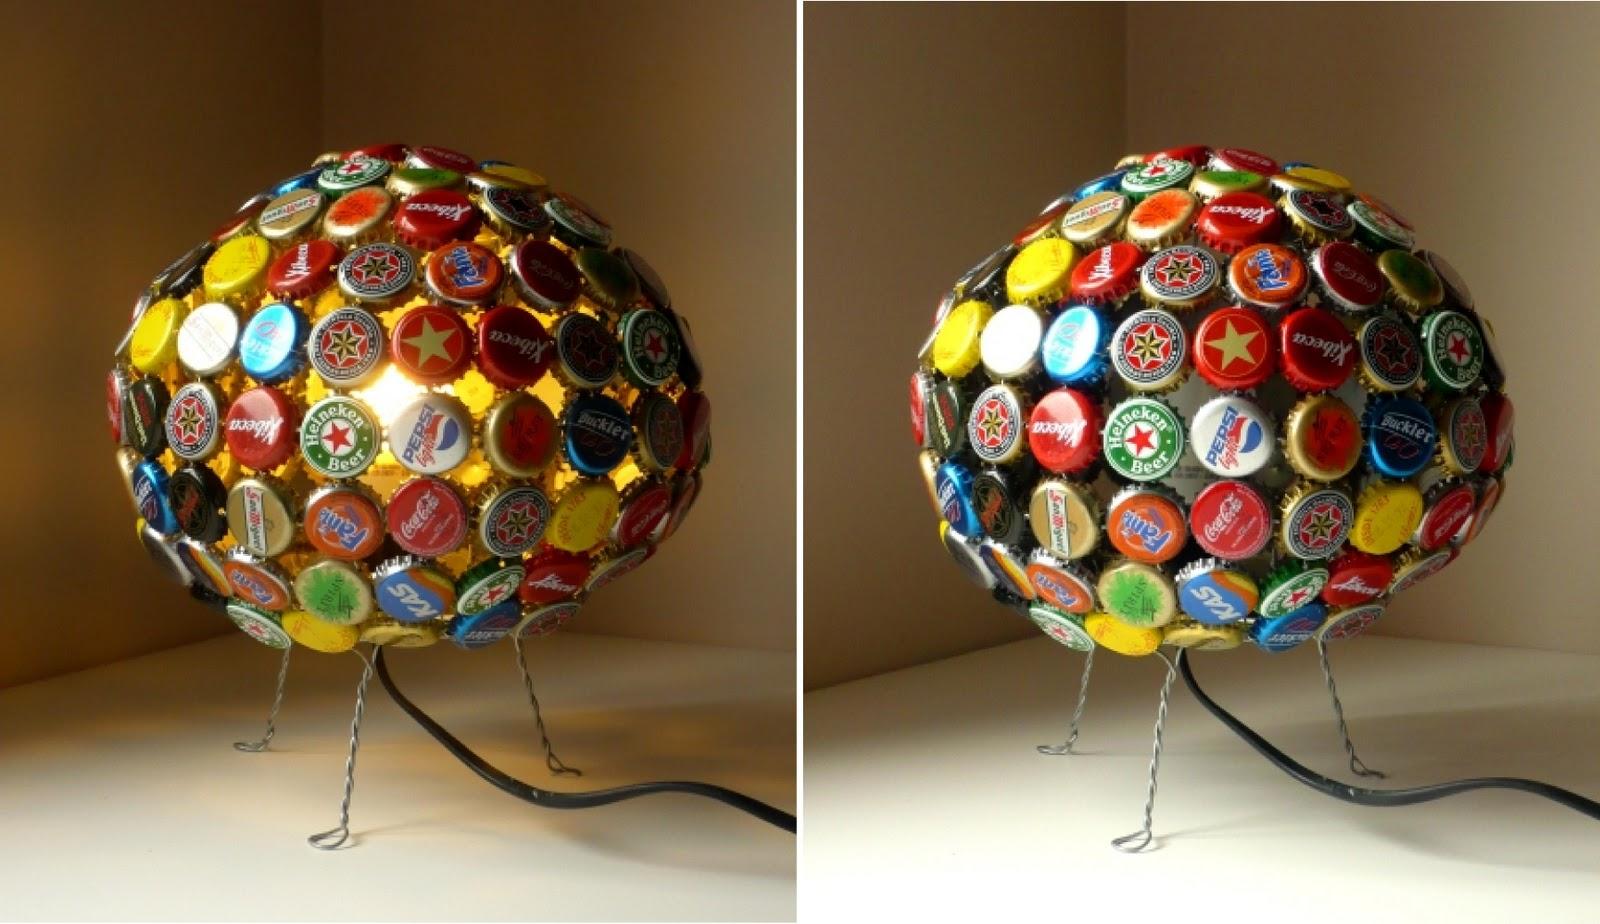 Iturriadesign 20 lamparas recicladas - Lamparas originales recicladas ...